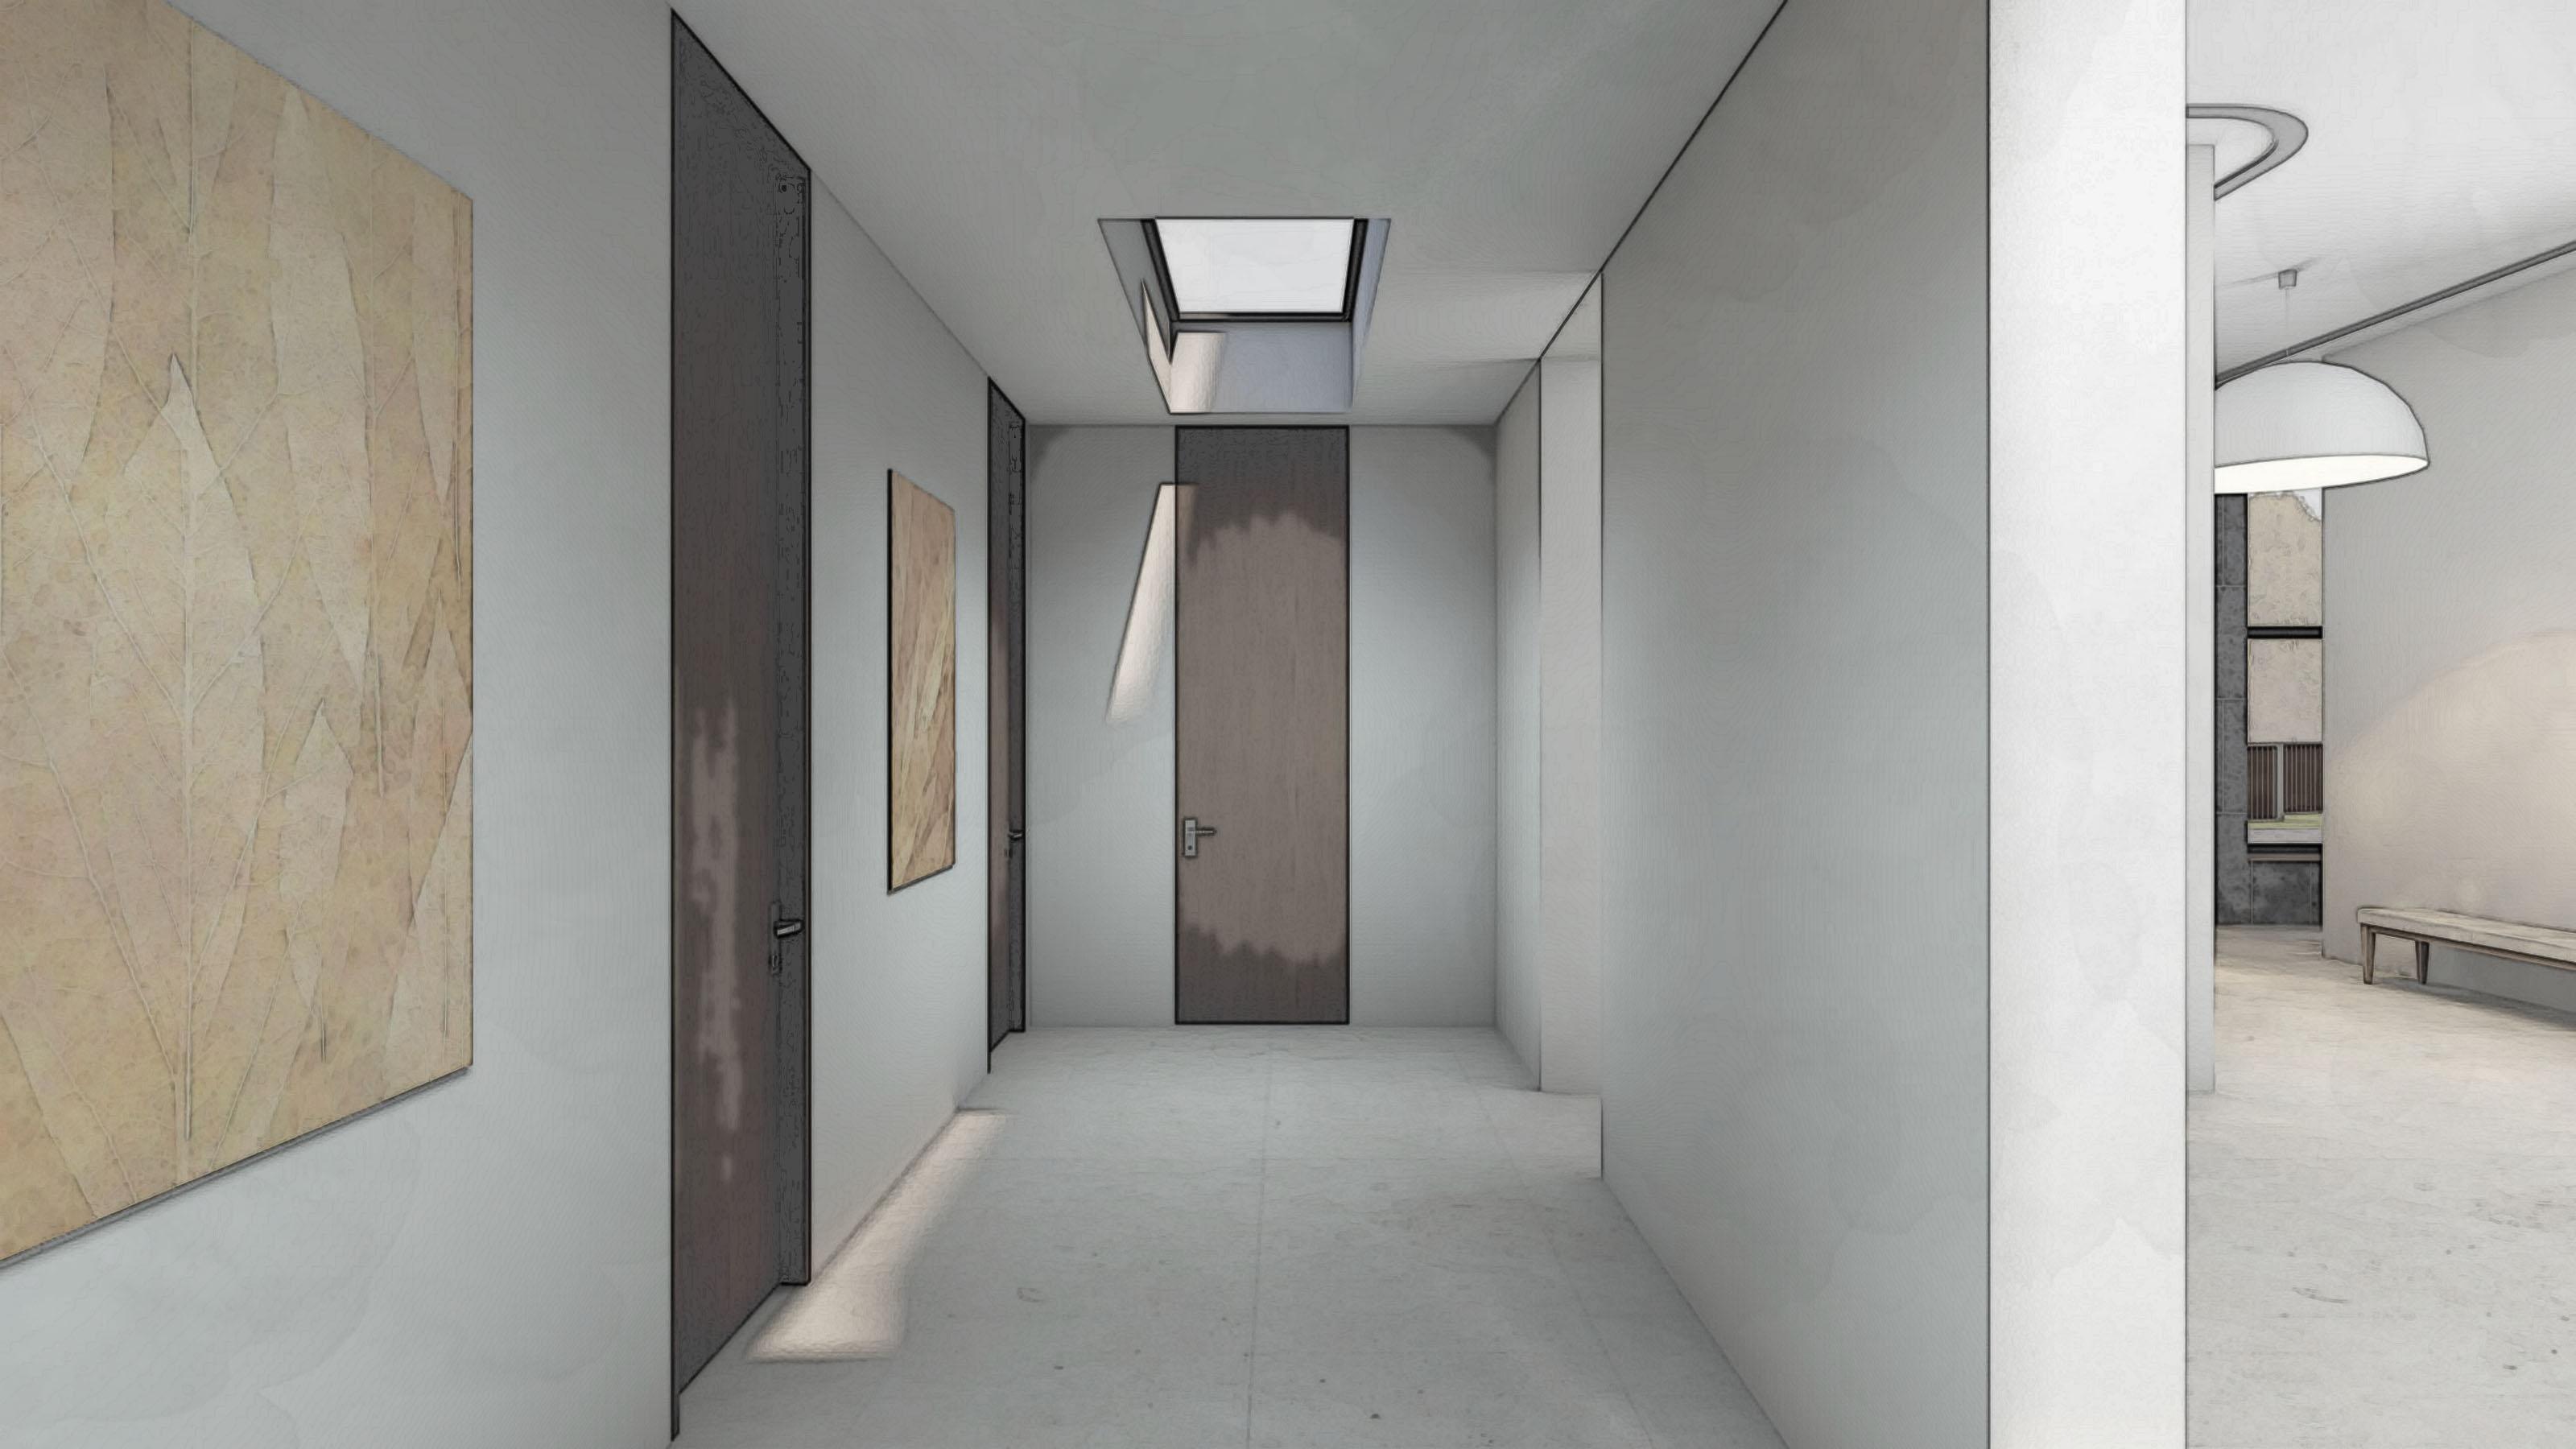 Изображение для проекта Проект особняка в Латвии в стиле модерн 2899